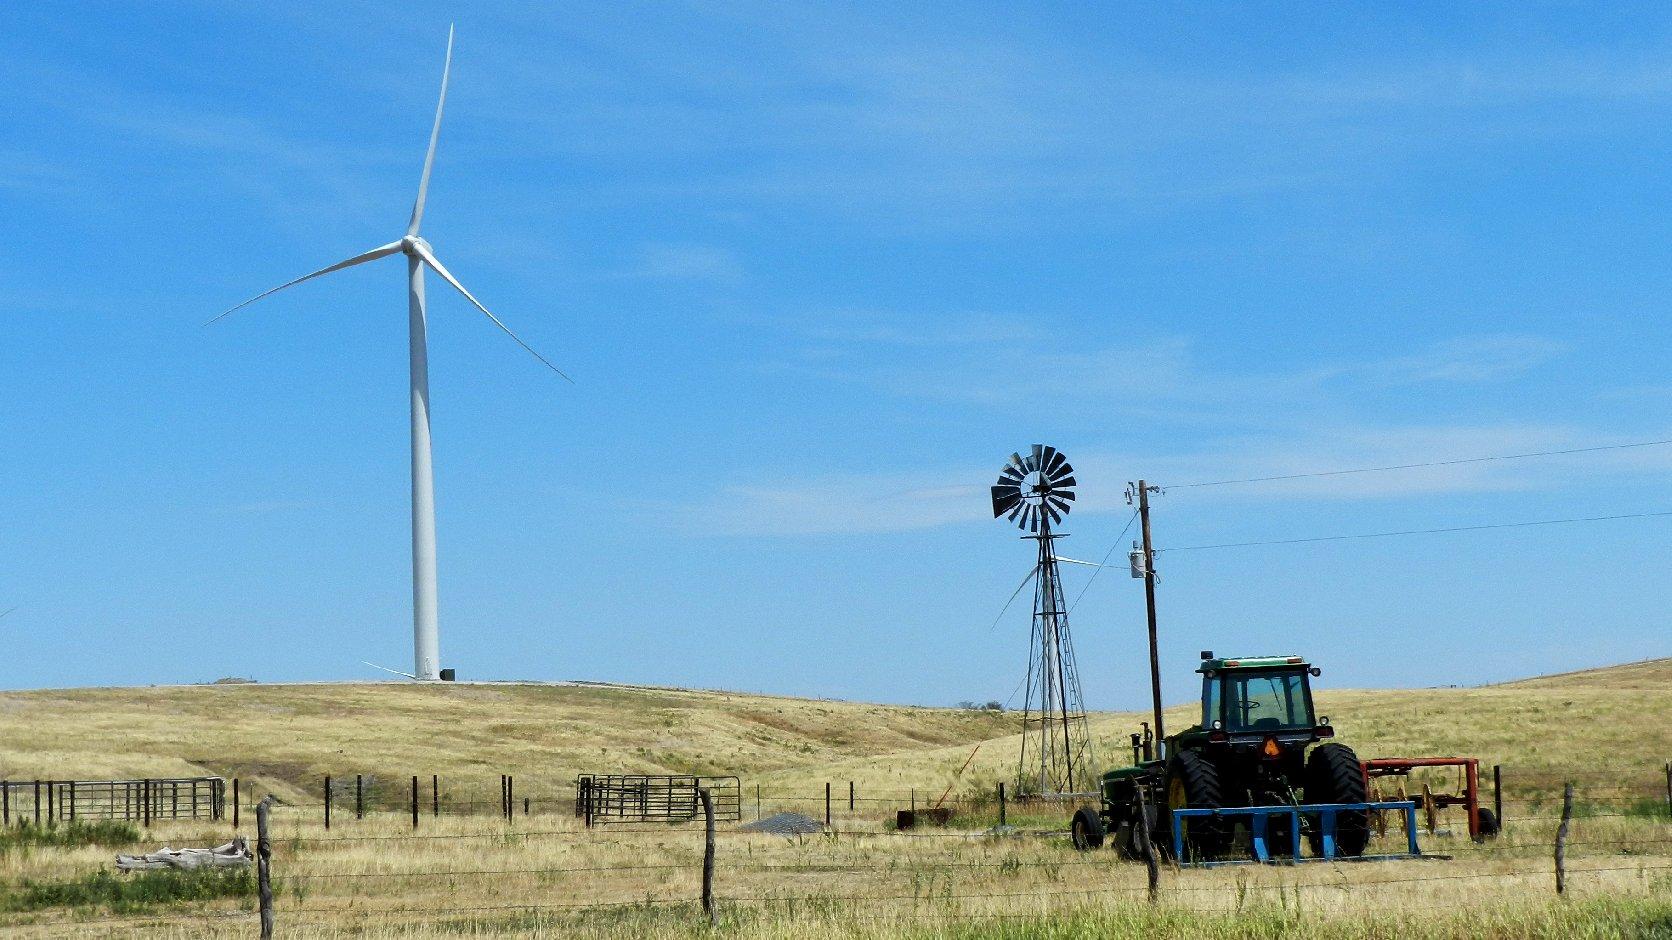 Wind Energy And Wildlife Nebraska Strives For Coexistence Quest Power Brokenbow1 A Turbine